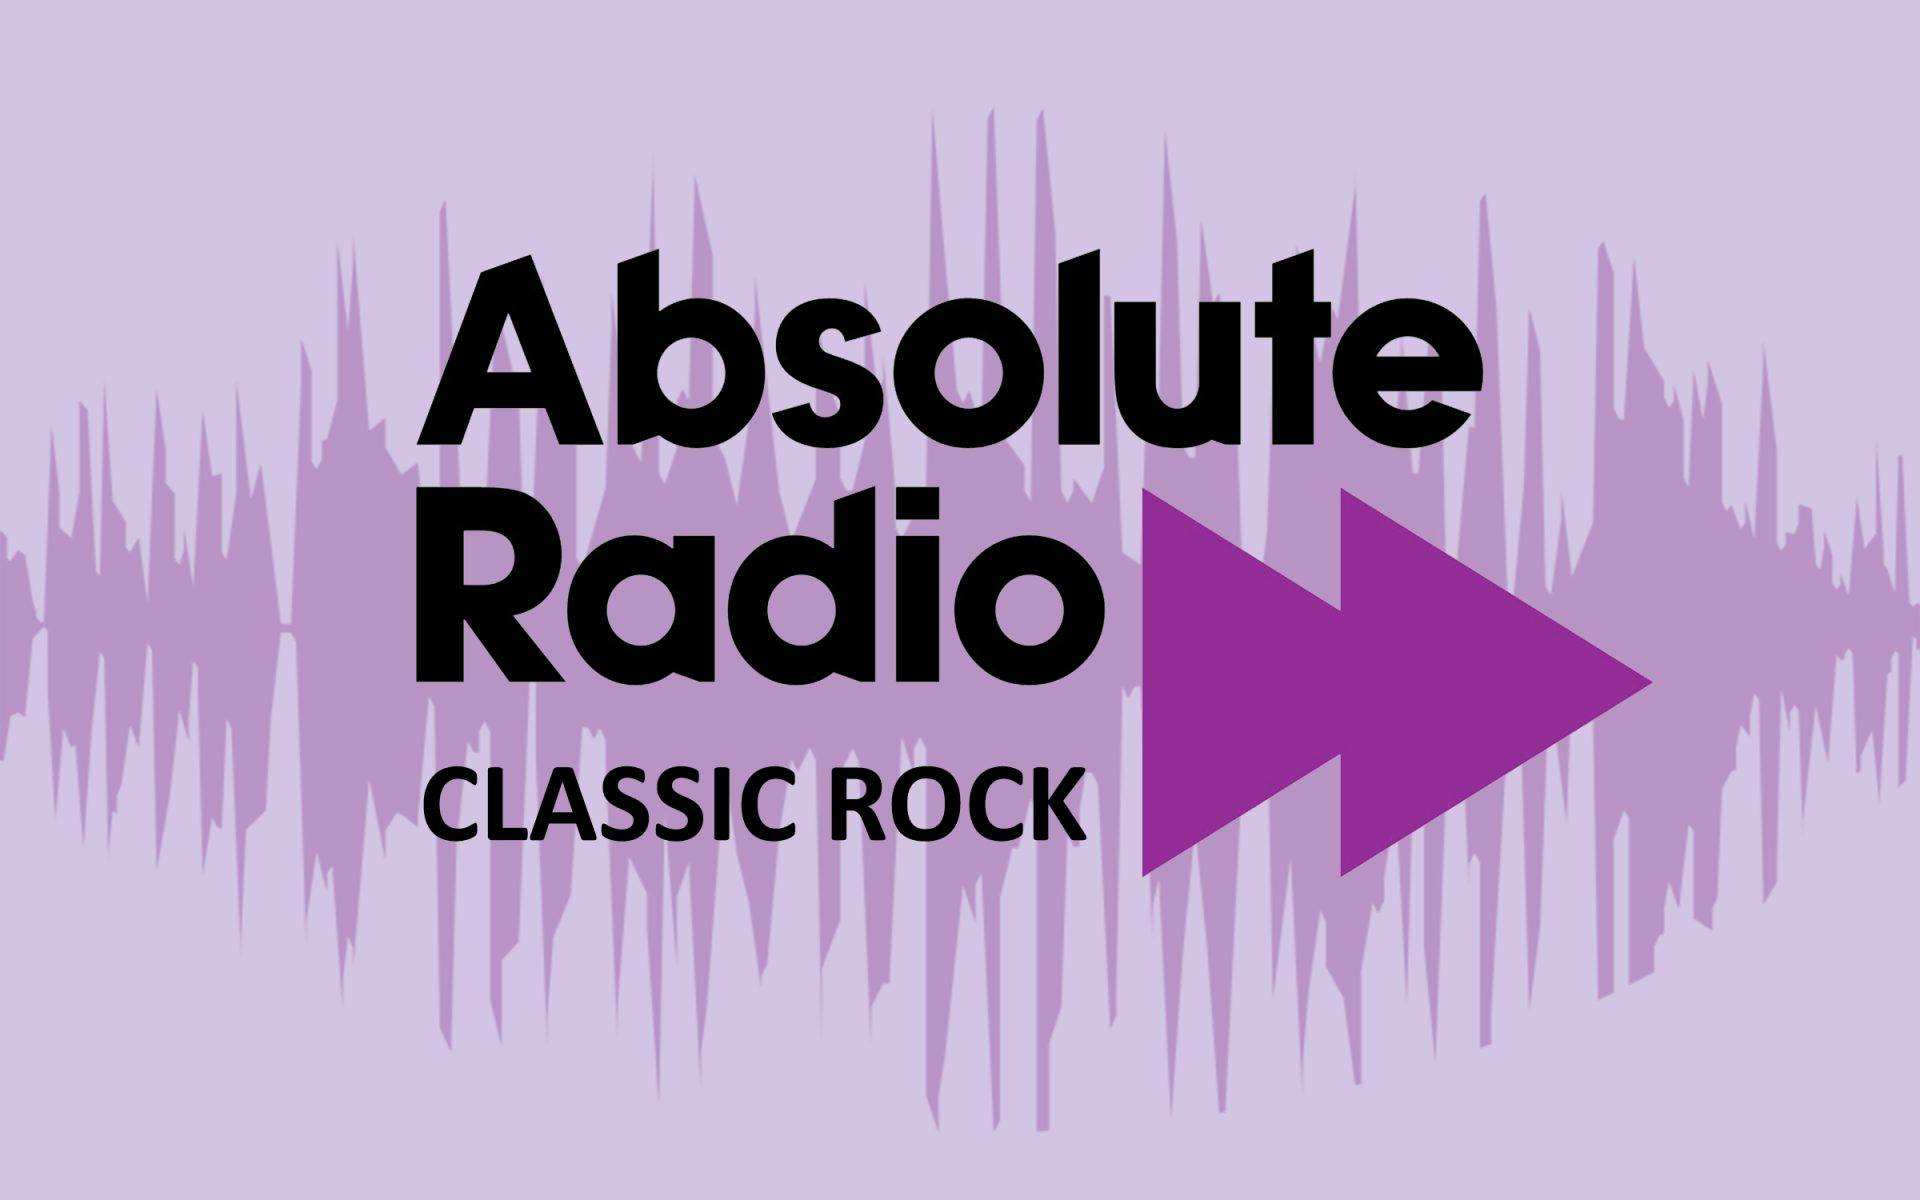 Absolute classic radio